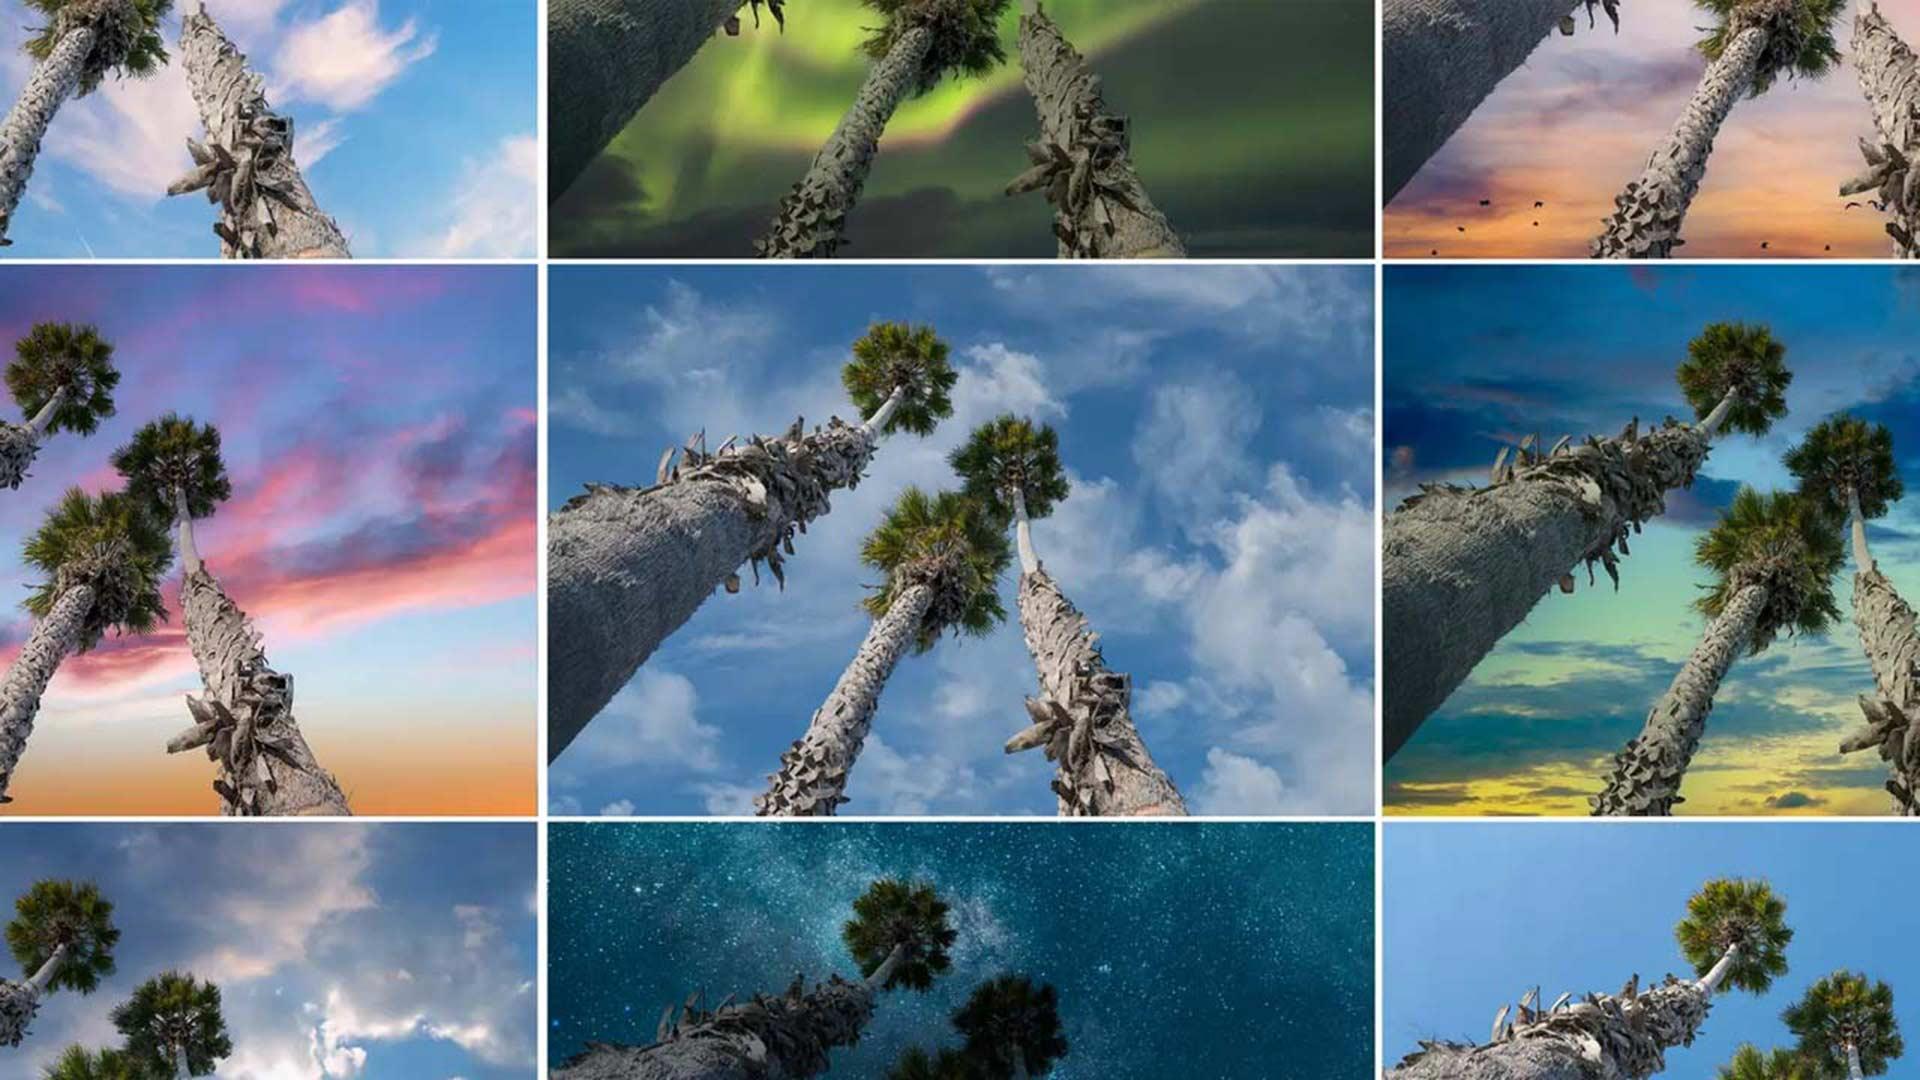 Image: Adobe.